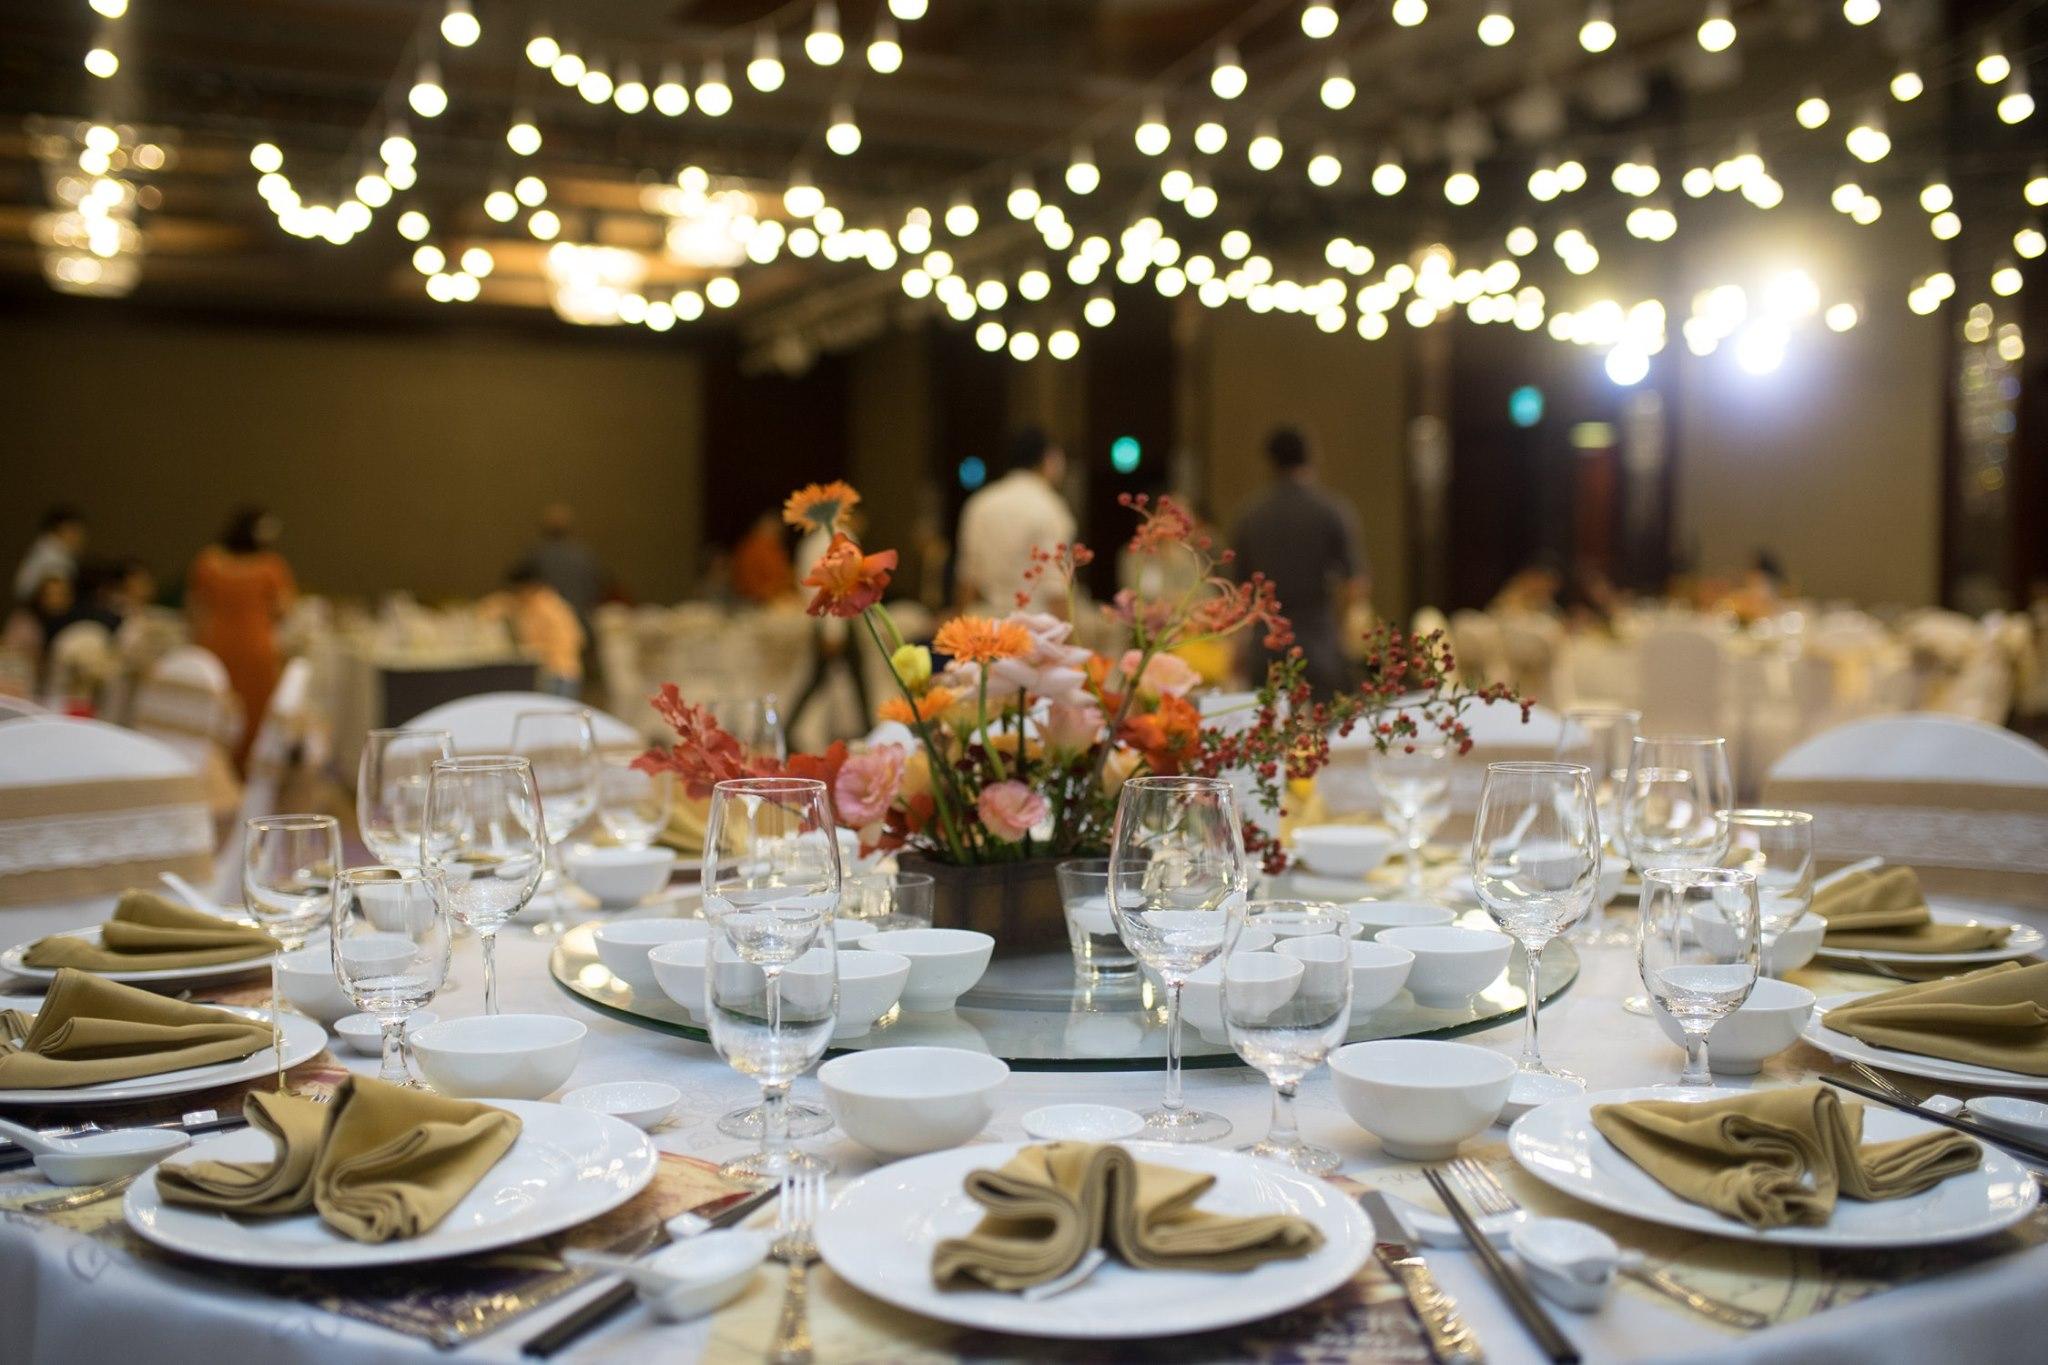 Hanoi hotel wedding banquet table arrangement